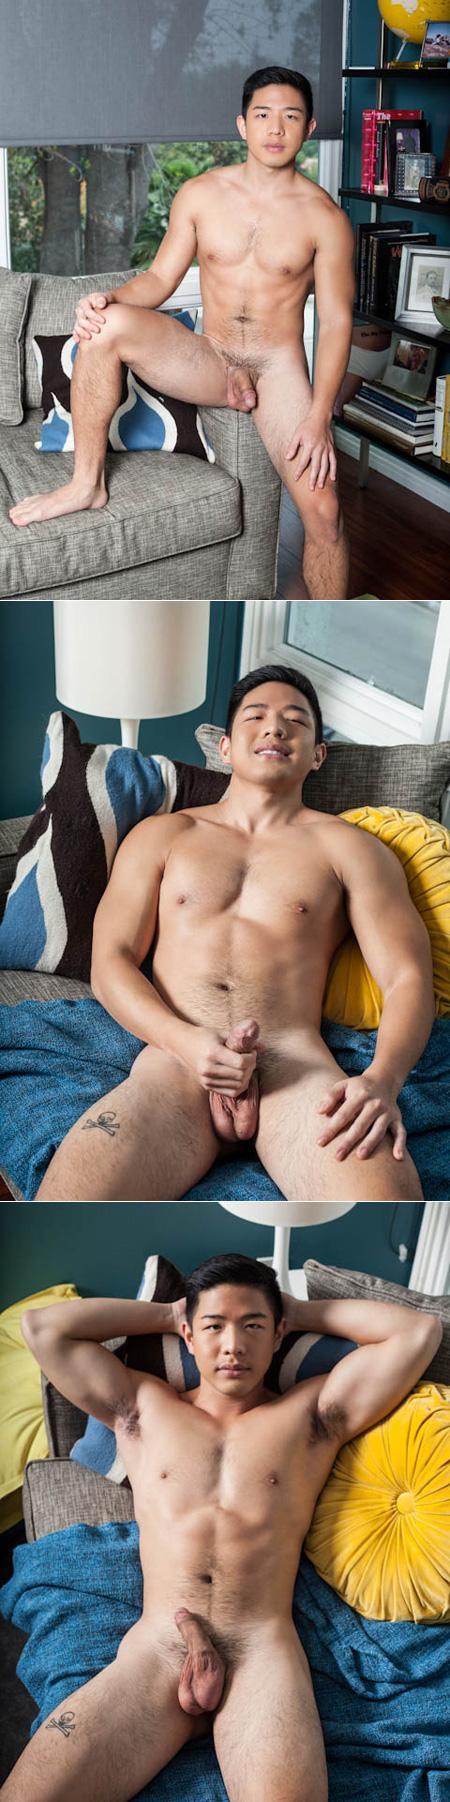 Hairy muscular Asian man grabbing his dick.